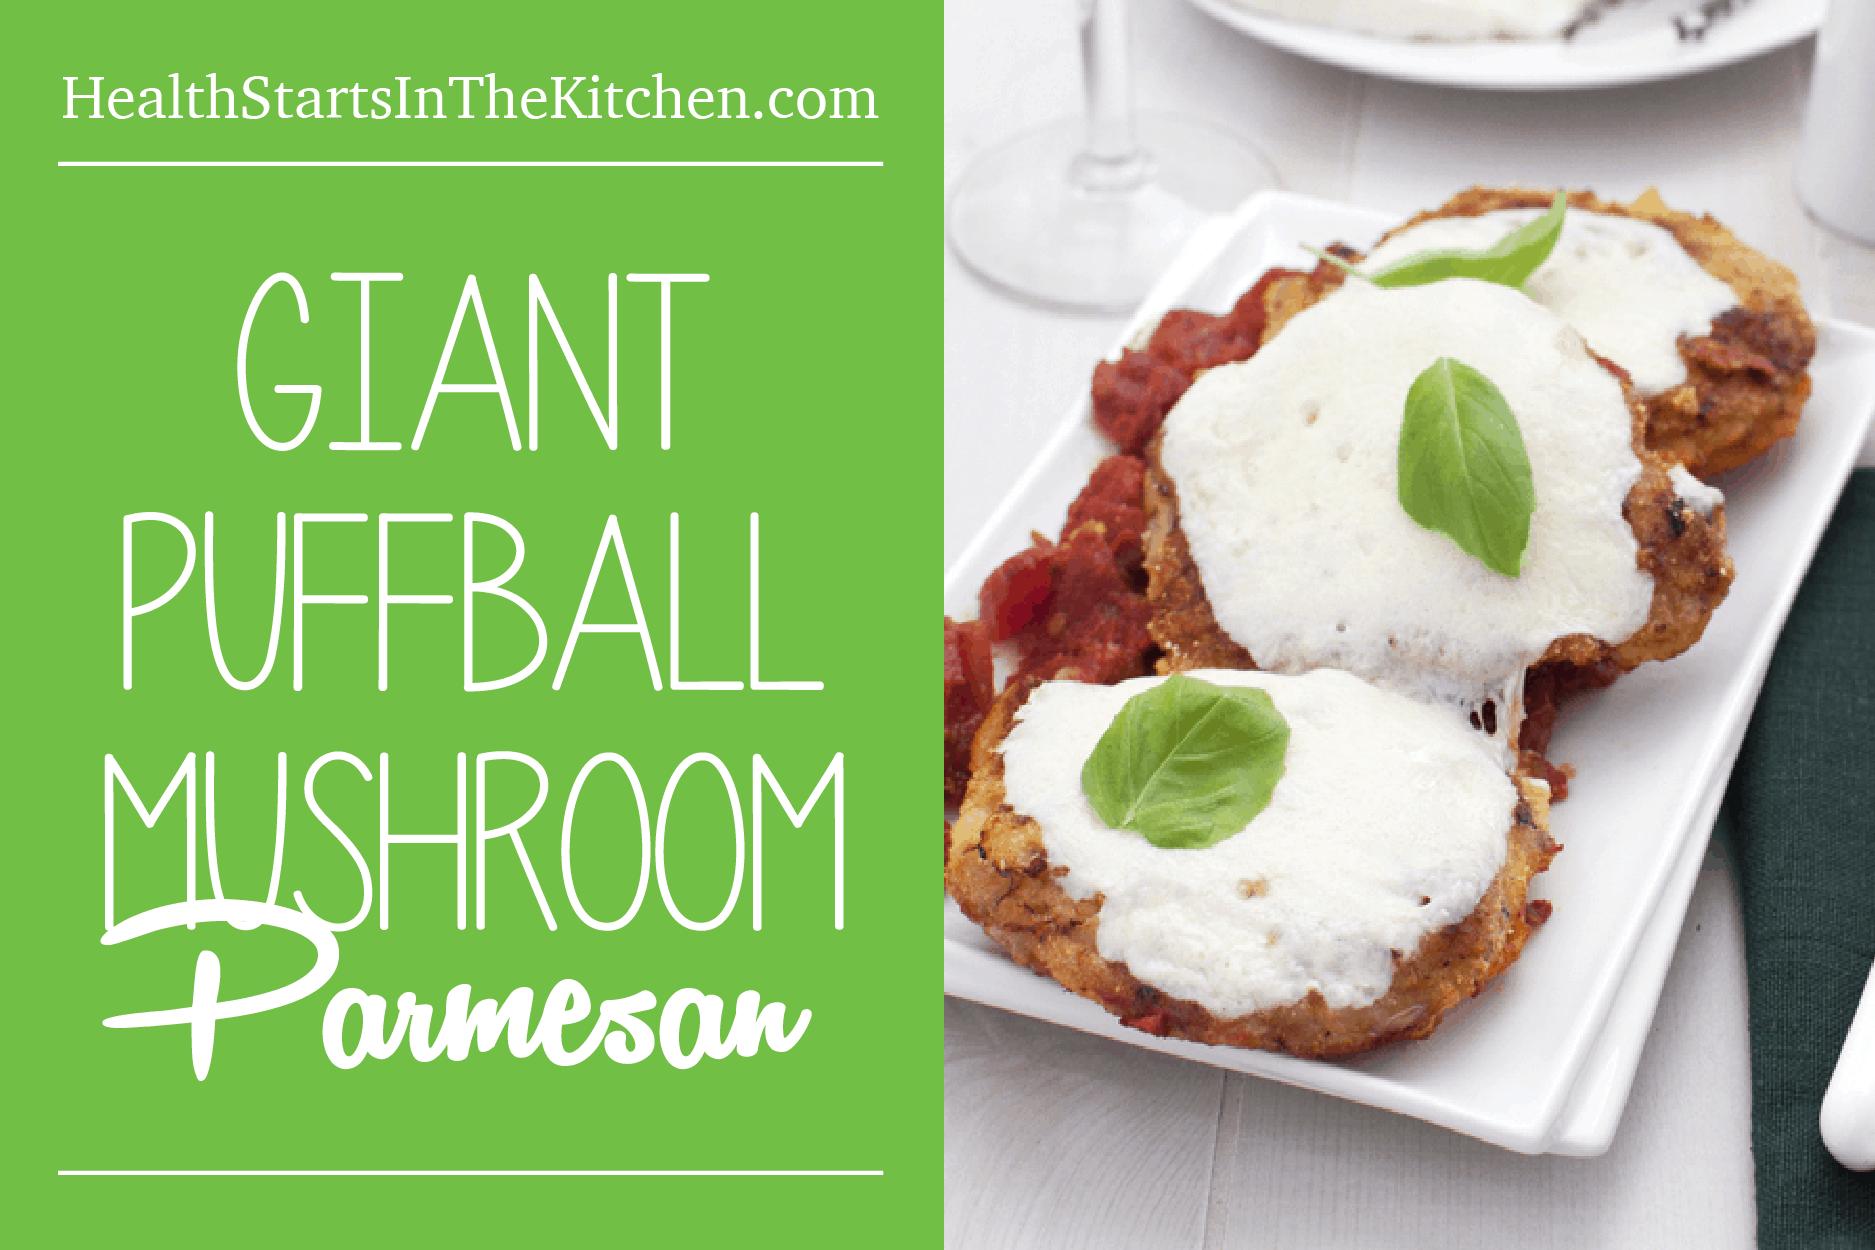 Giant Puffball Mushroom Parmesan